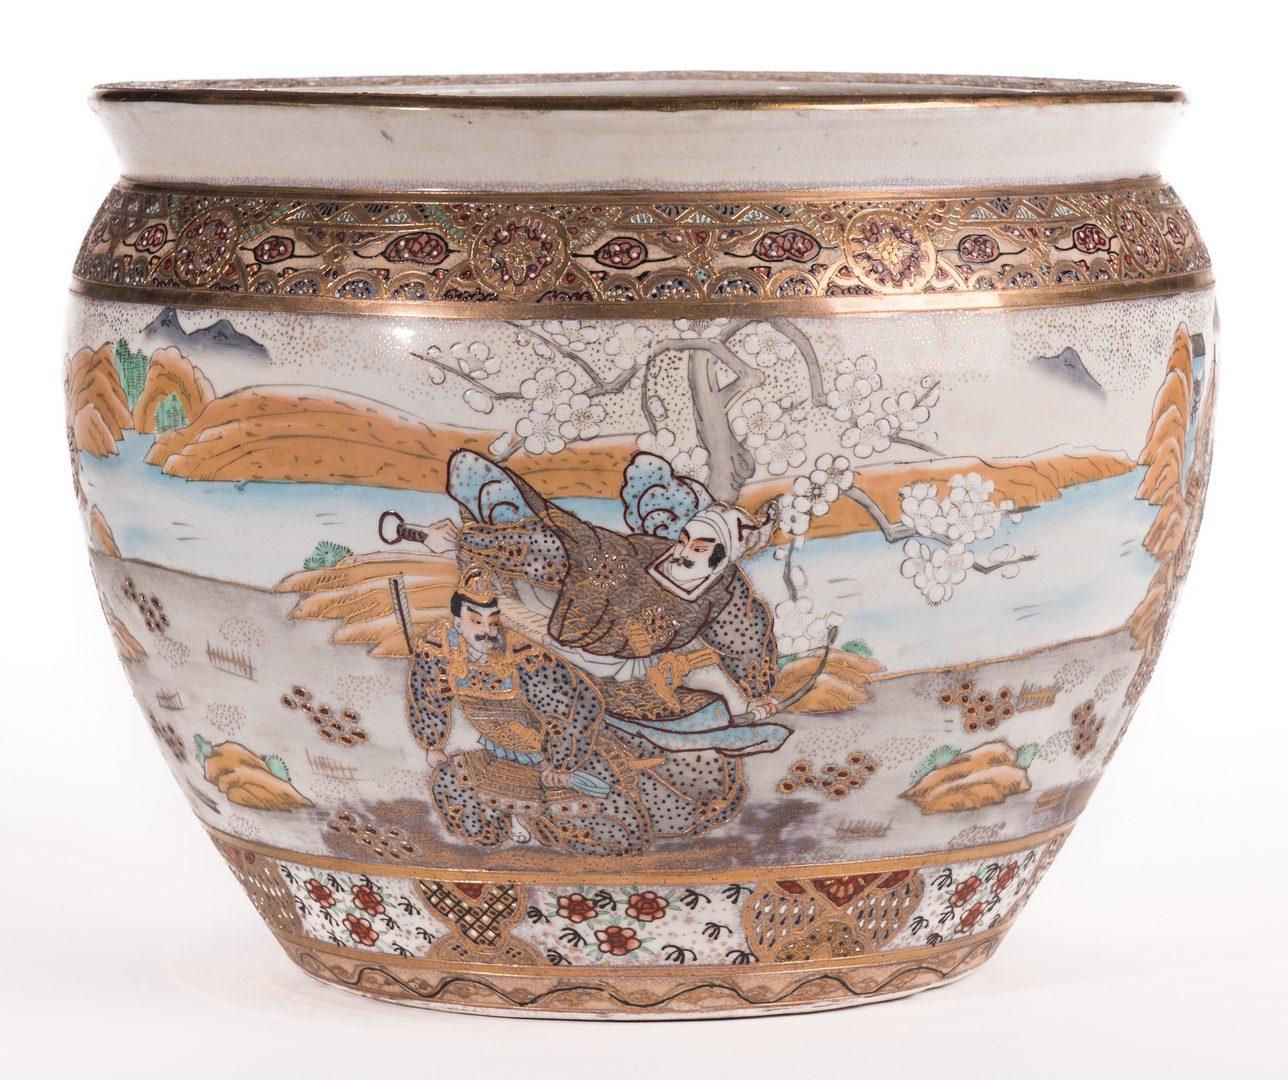 Lot 141: Japanese Satsuma Porcelain Fish Bowl